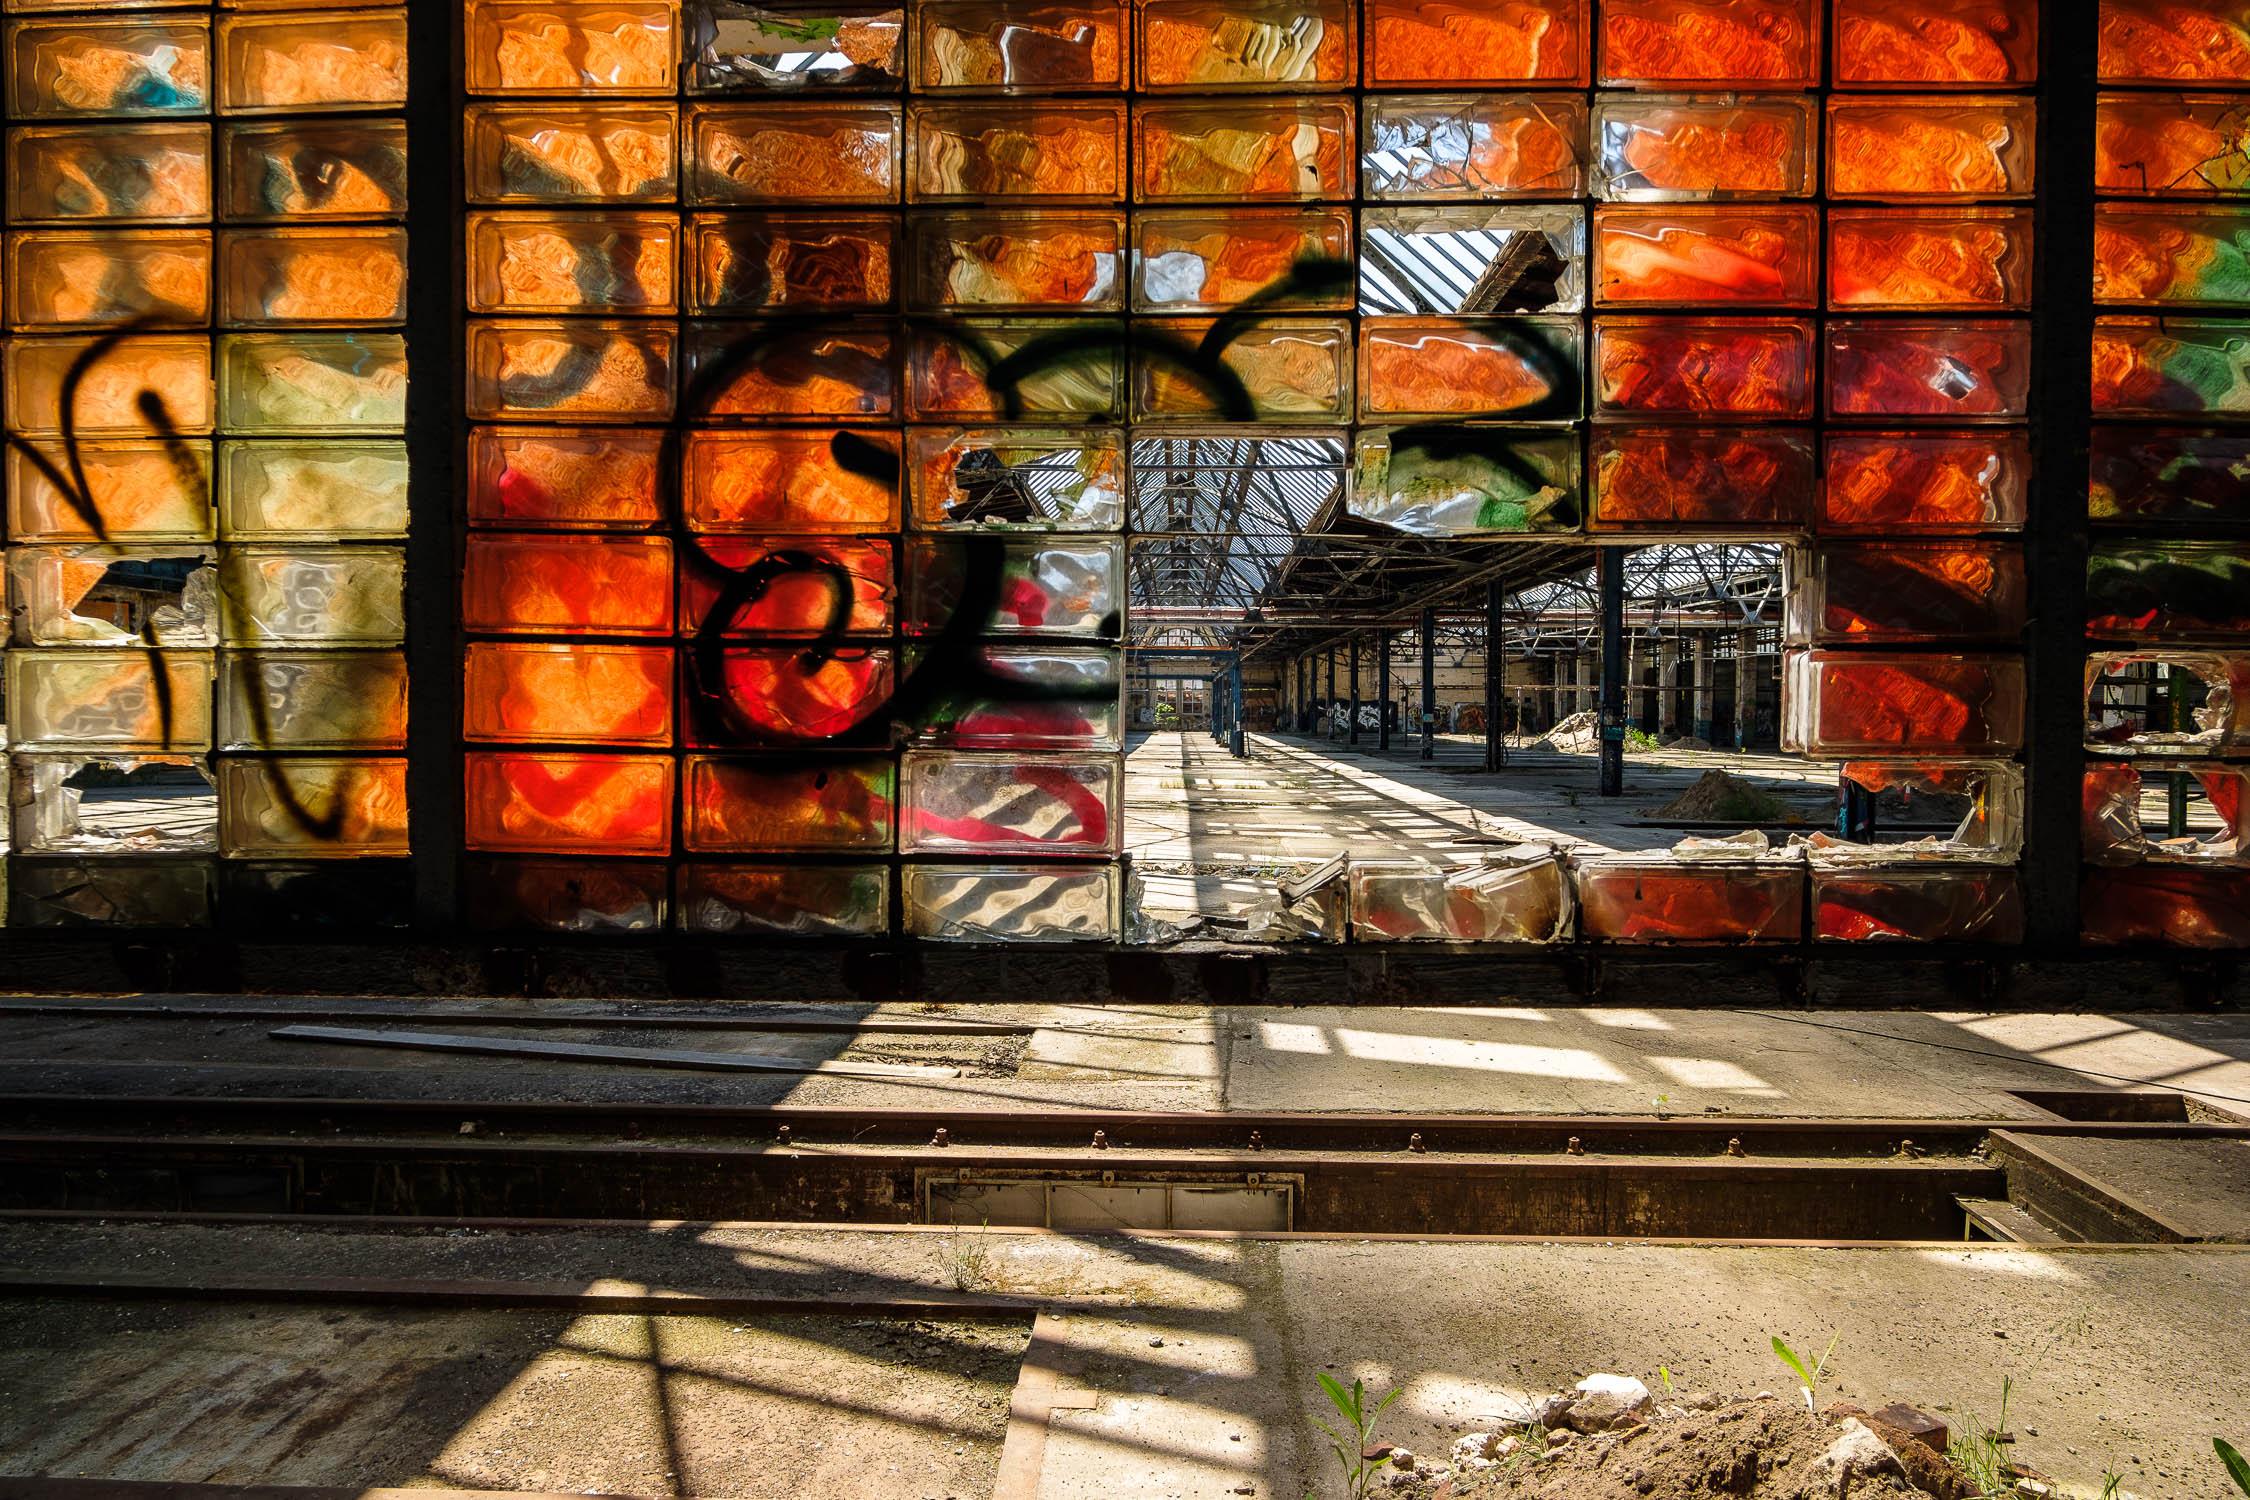 bdp-real-estate-Becker-Daiber-Raw-Potsdam-Ruine-Fotos-Annette-Koroll-6